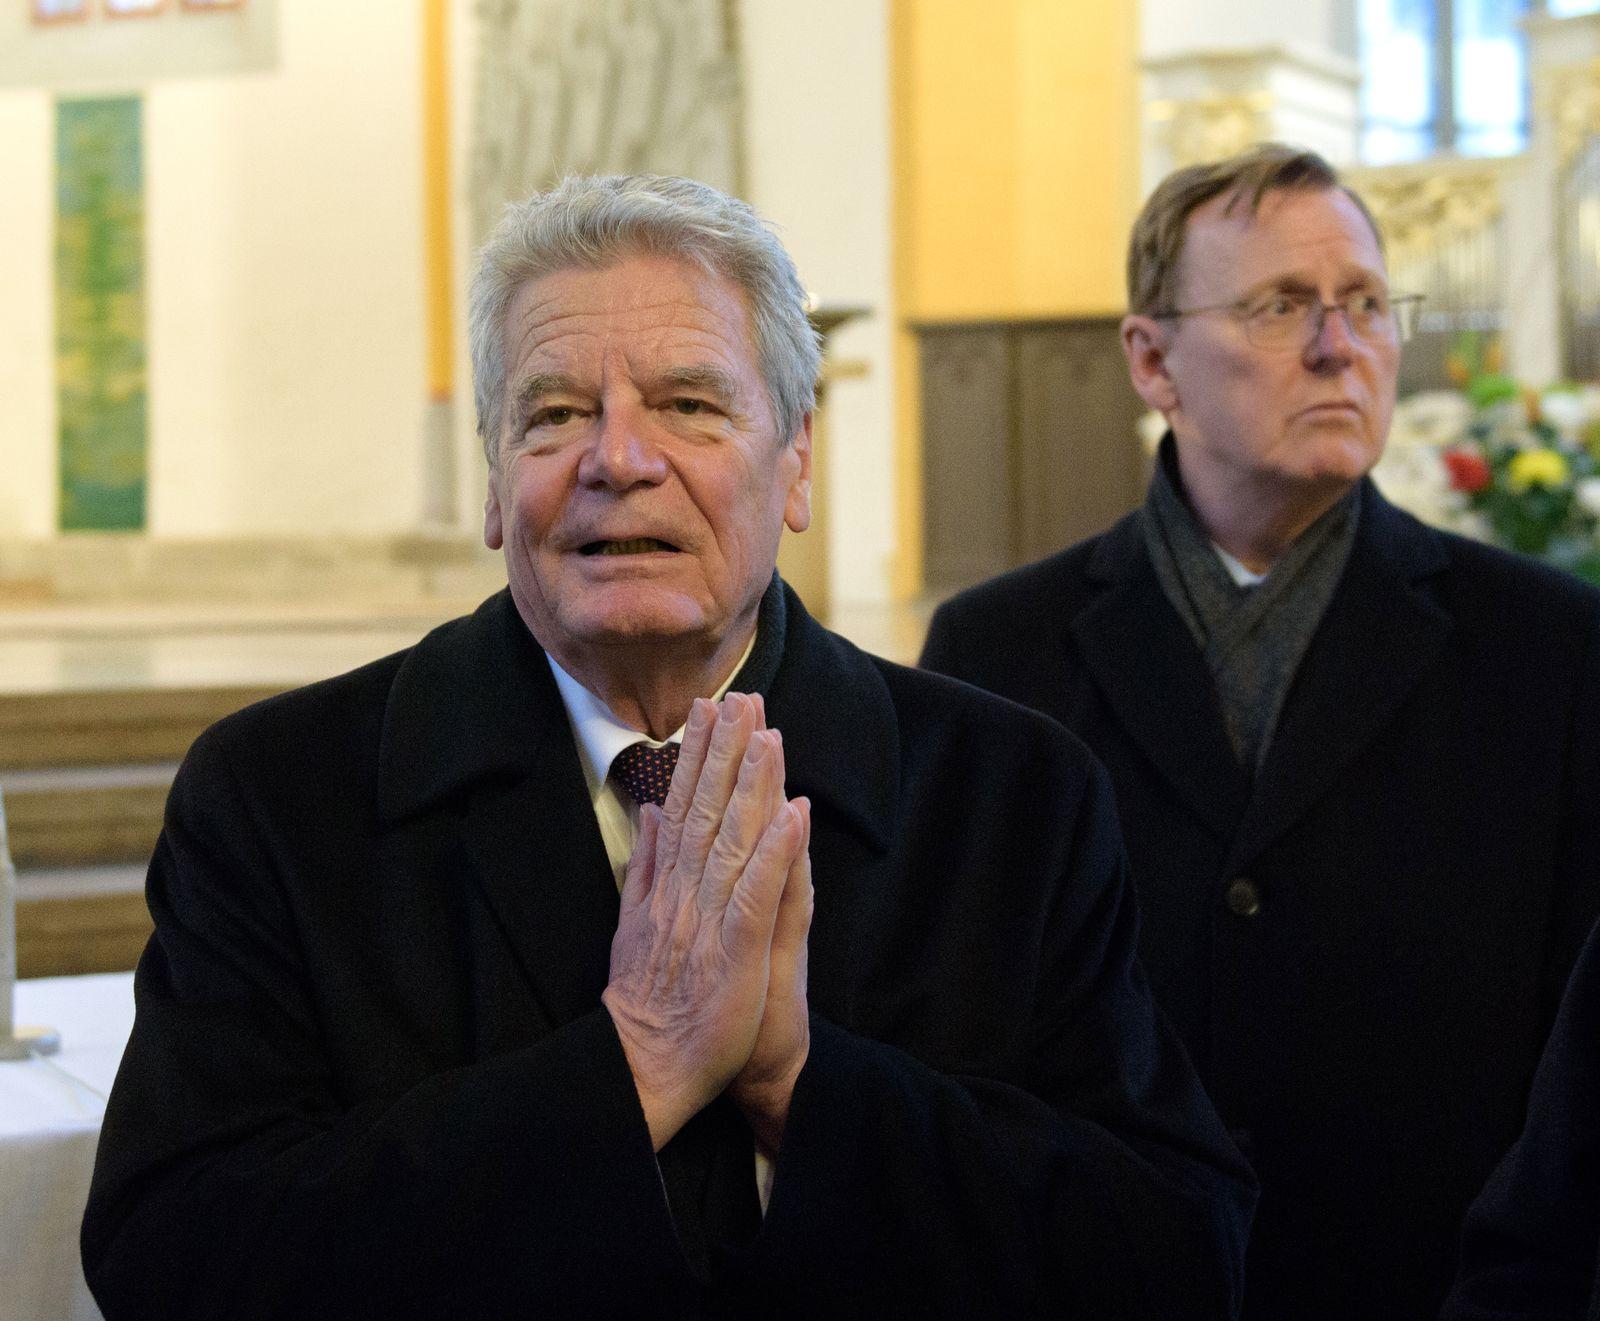 Bundespräsident Gauck in Jena